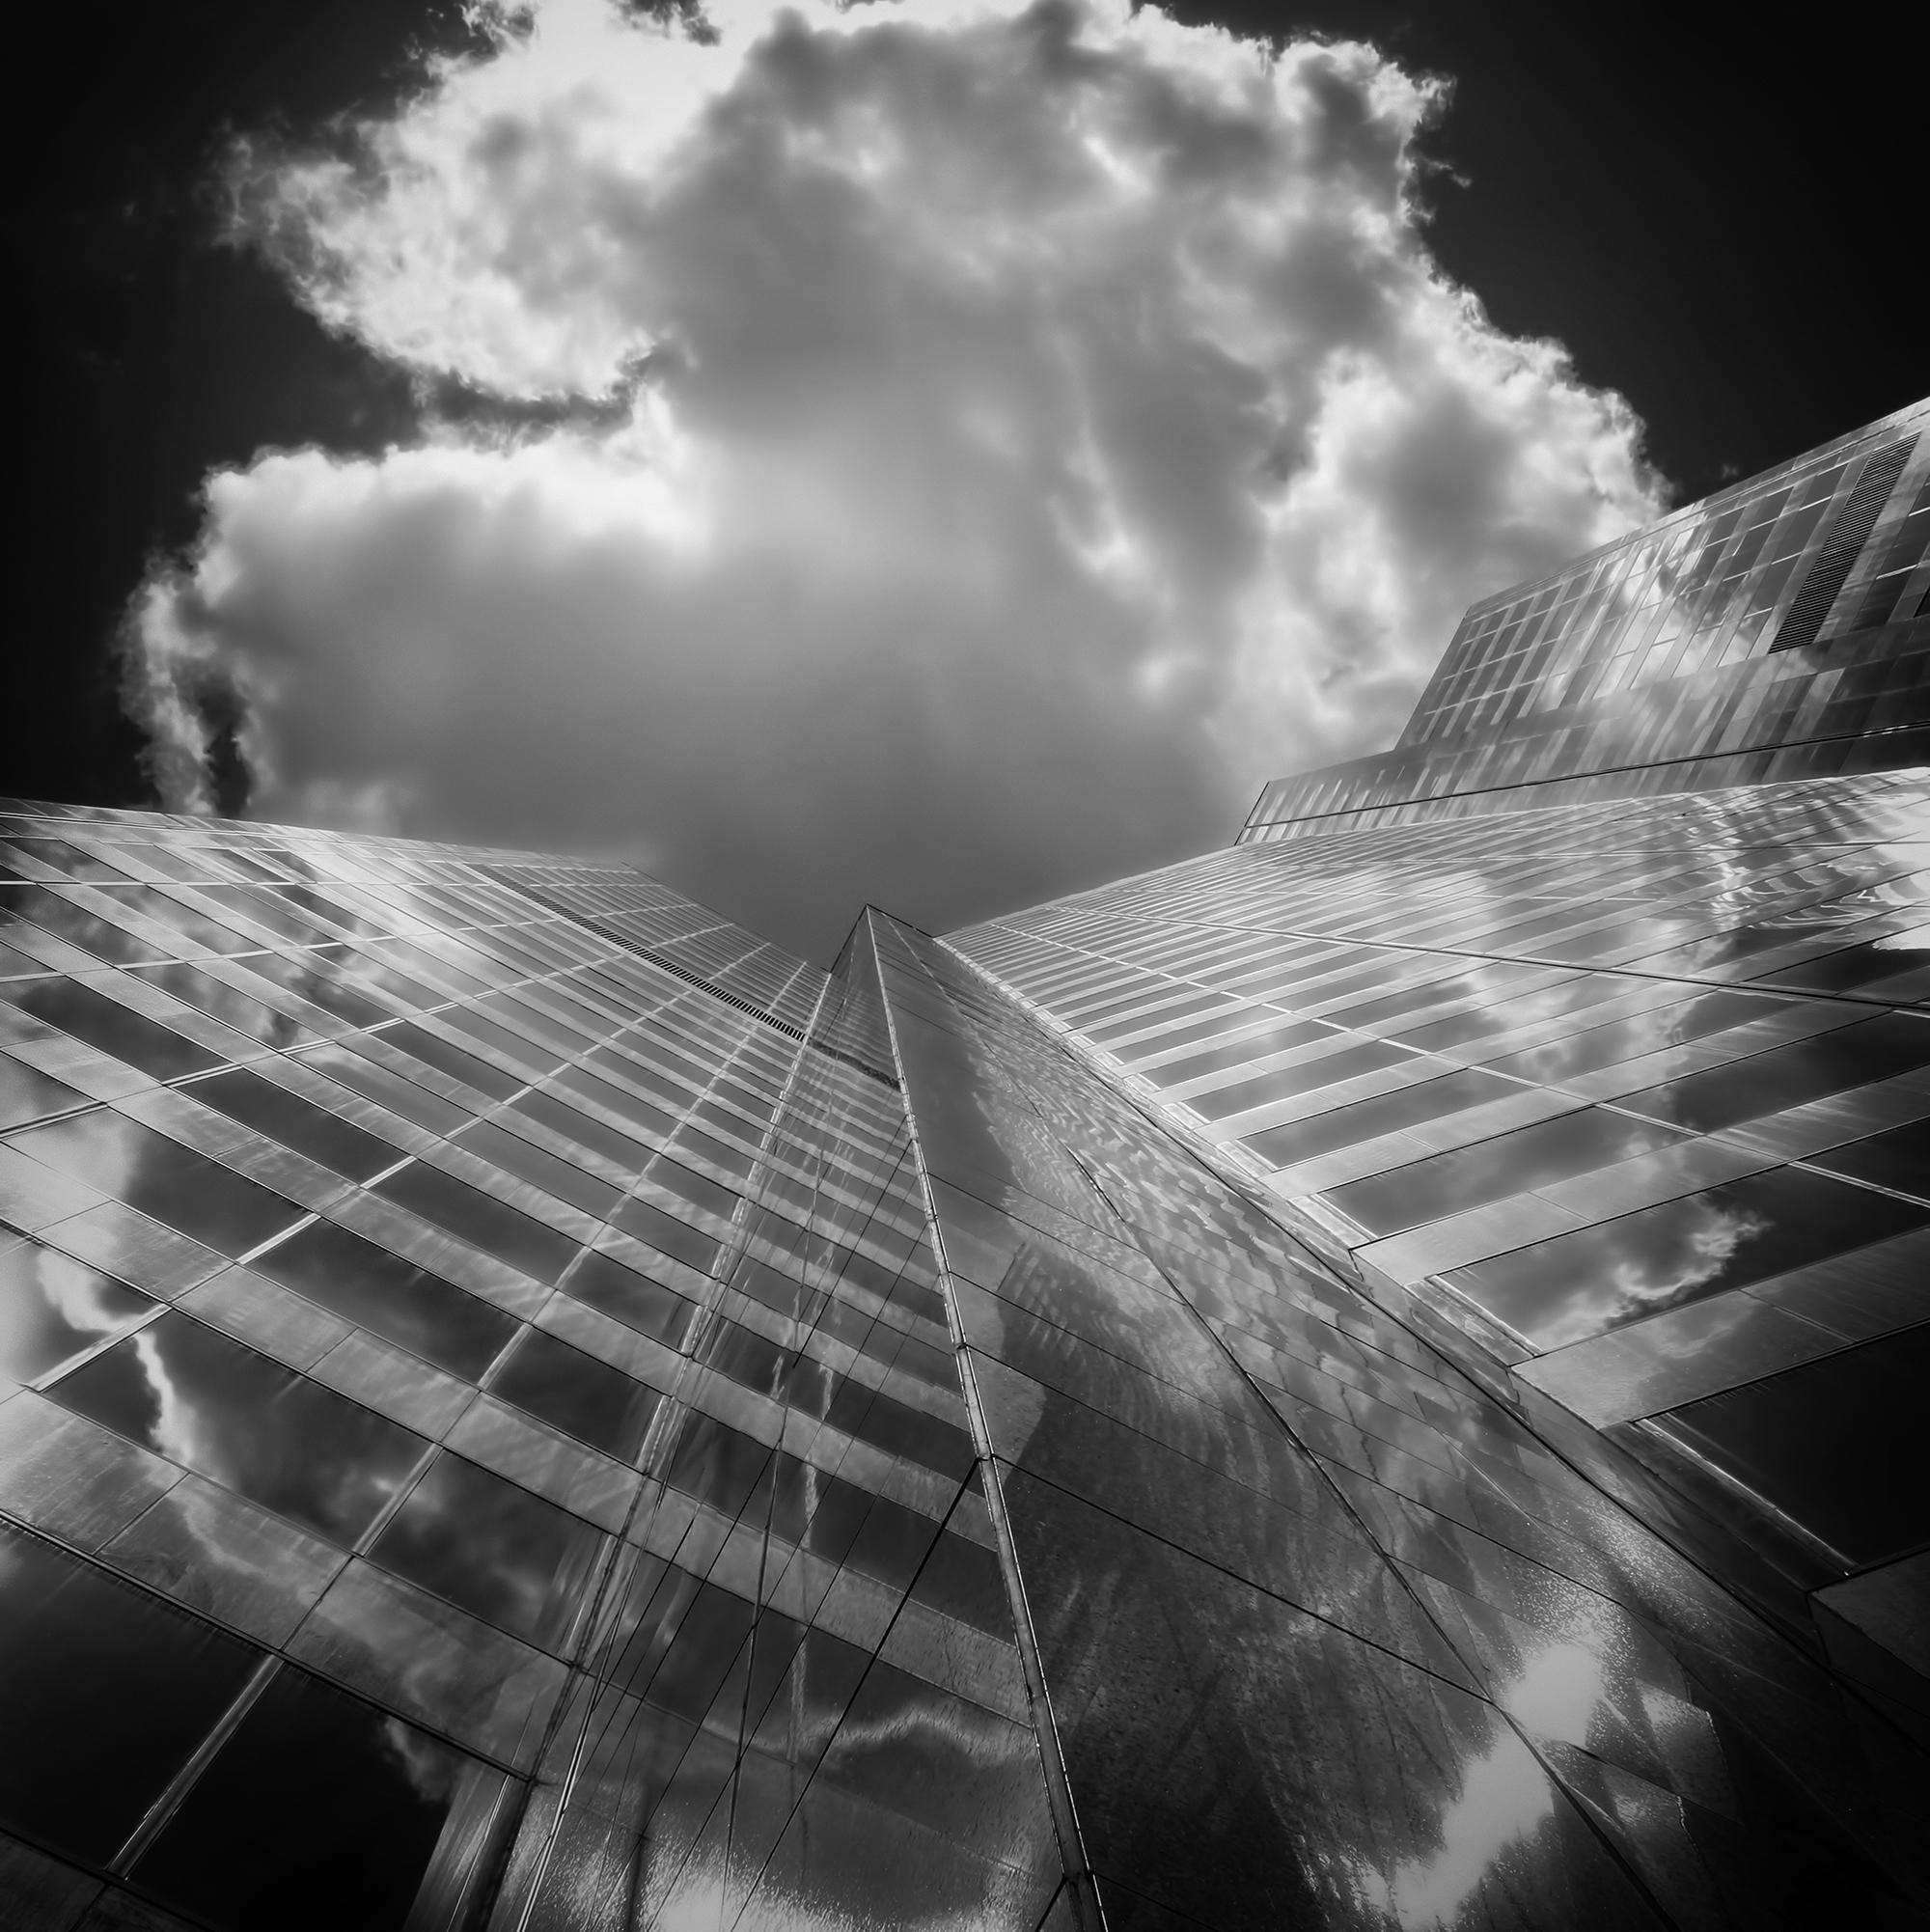 Toronto GTA black and white photography fine art photography ontario canada  John Kosmopoulos